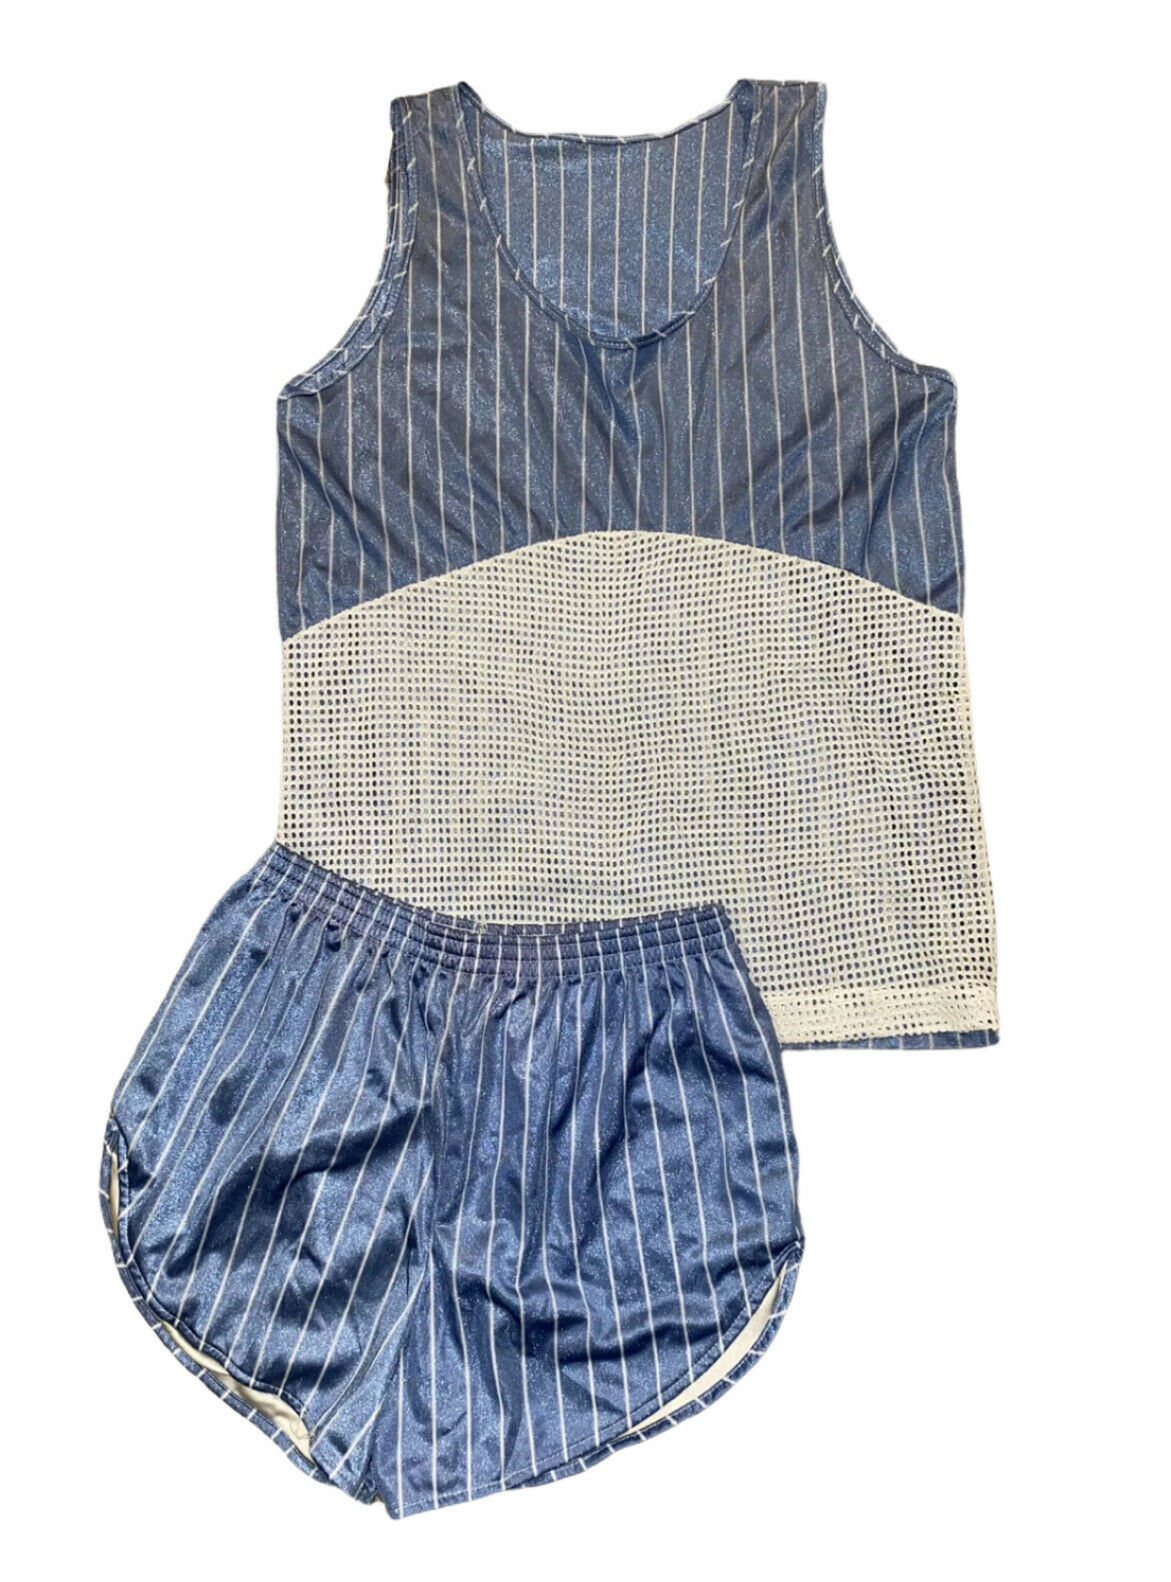 NOS vintage Running Mesh Tank Top and Running Shorts Set Light Blue Pinstripes M